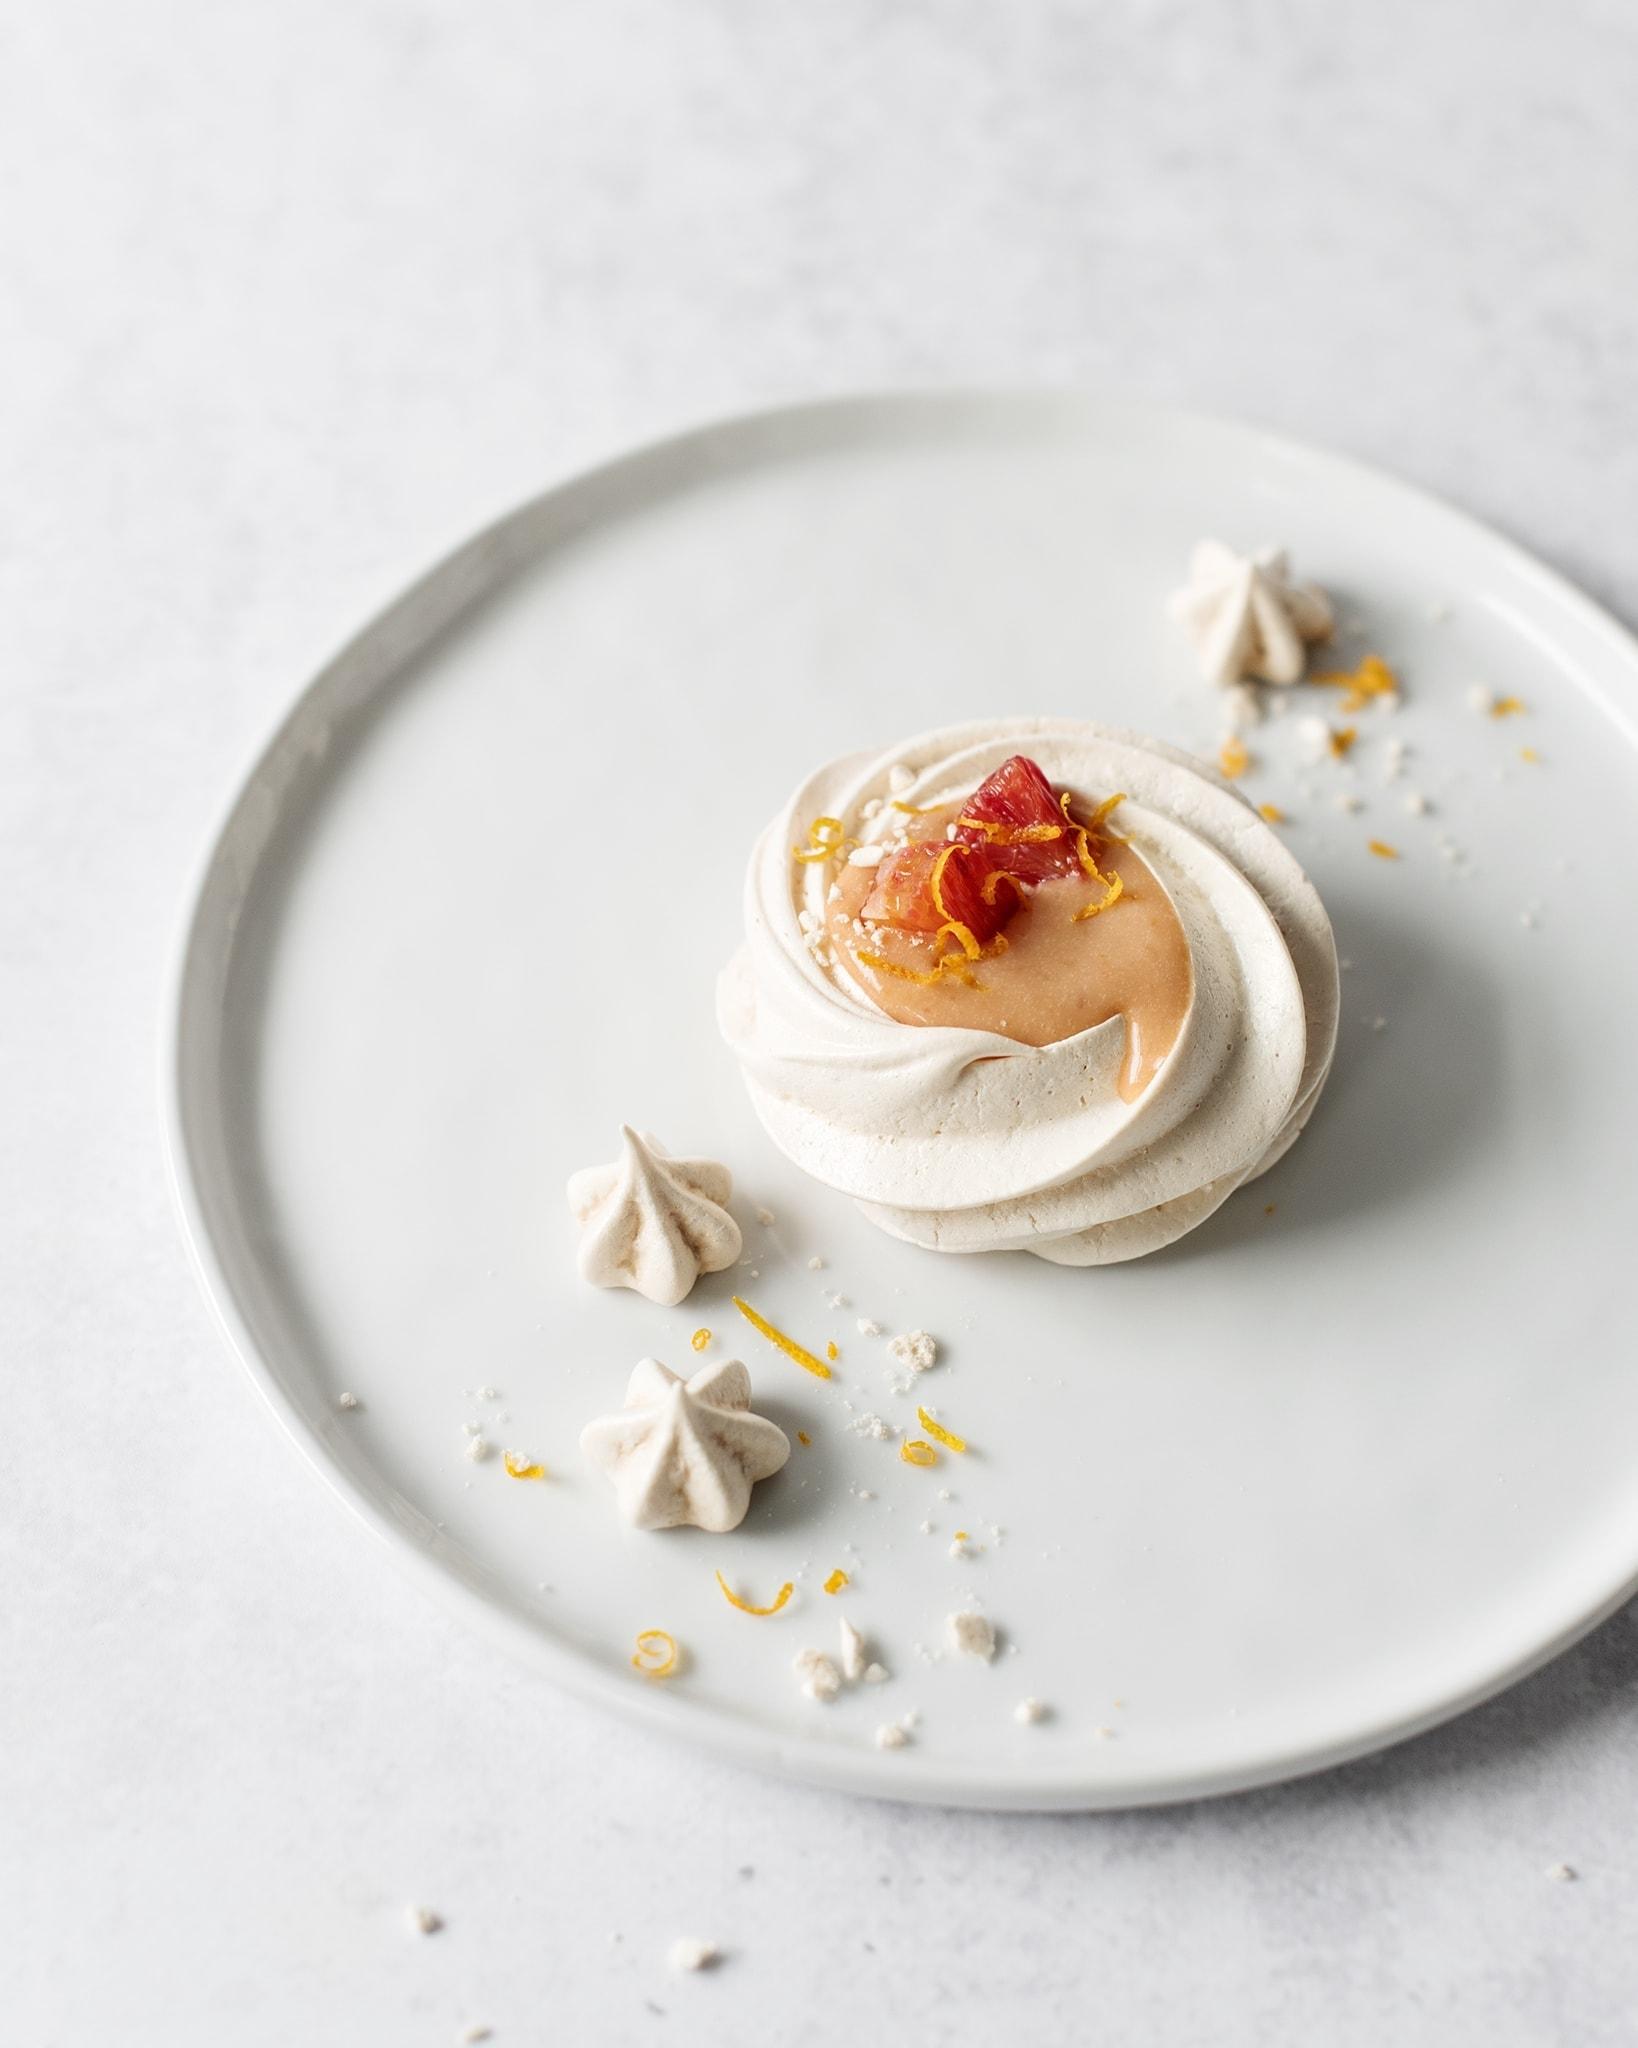 One blood orange pavlova on a white plate with mini meringues